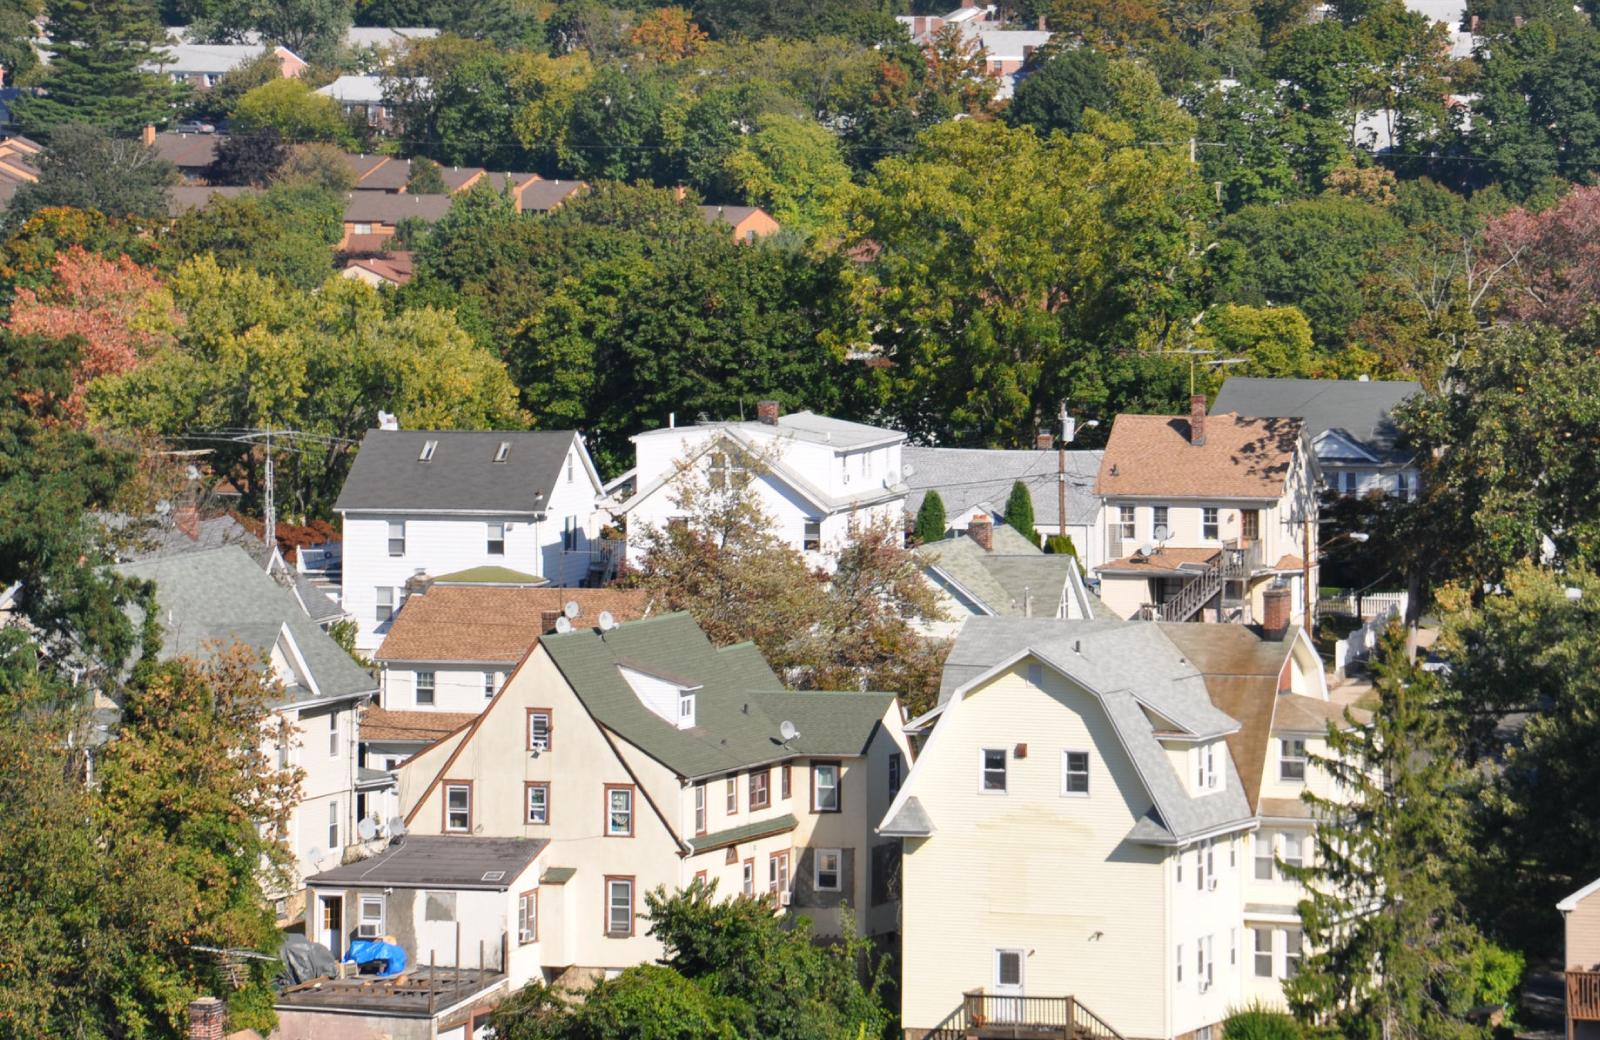 Norwalk Neighborhood - The Waypointe Apts